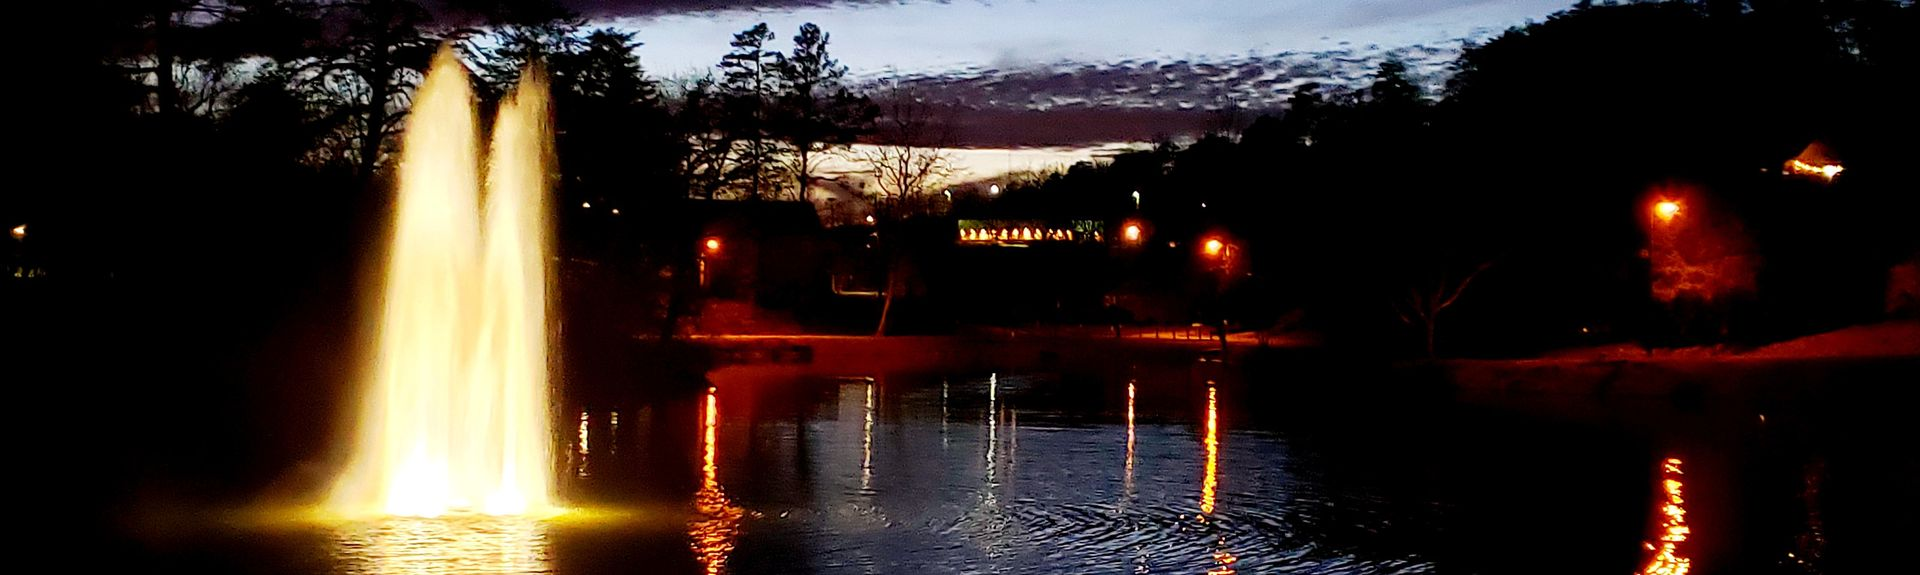 Swannanoa, North Carolina, United States of America